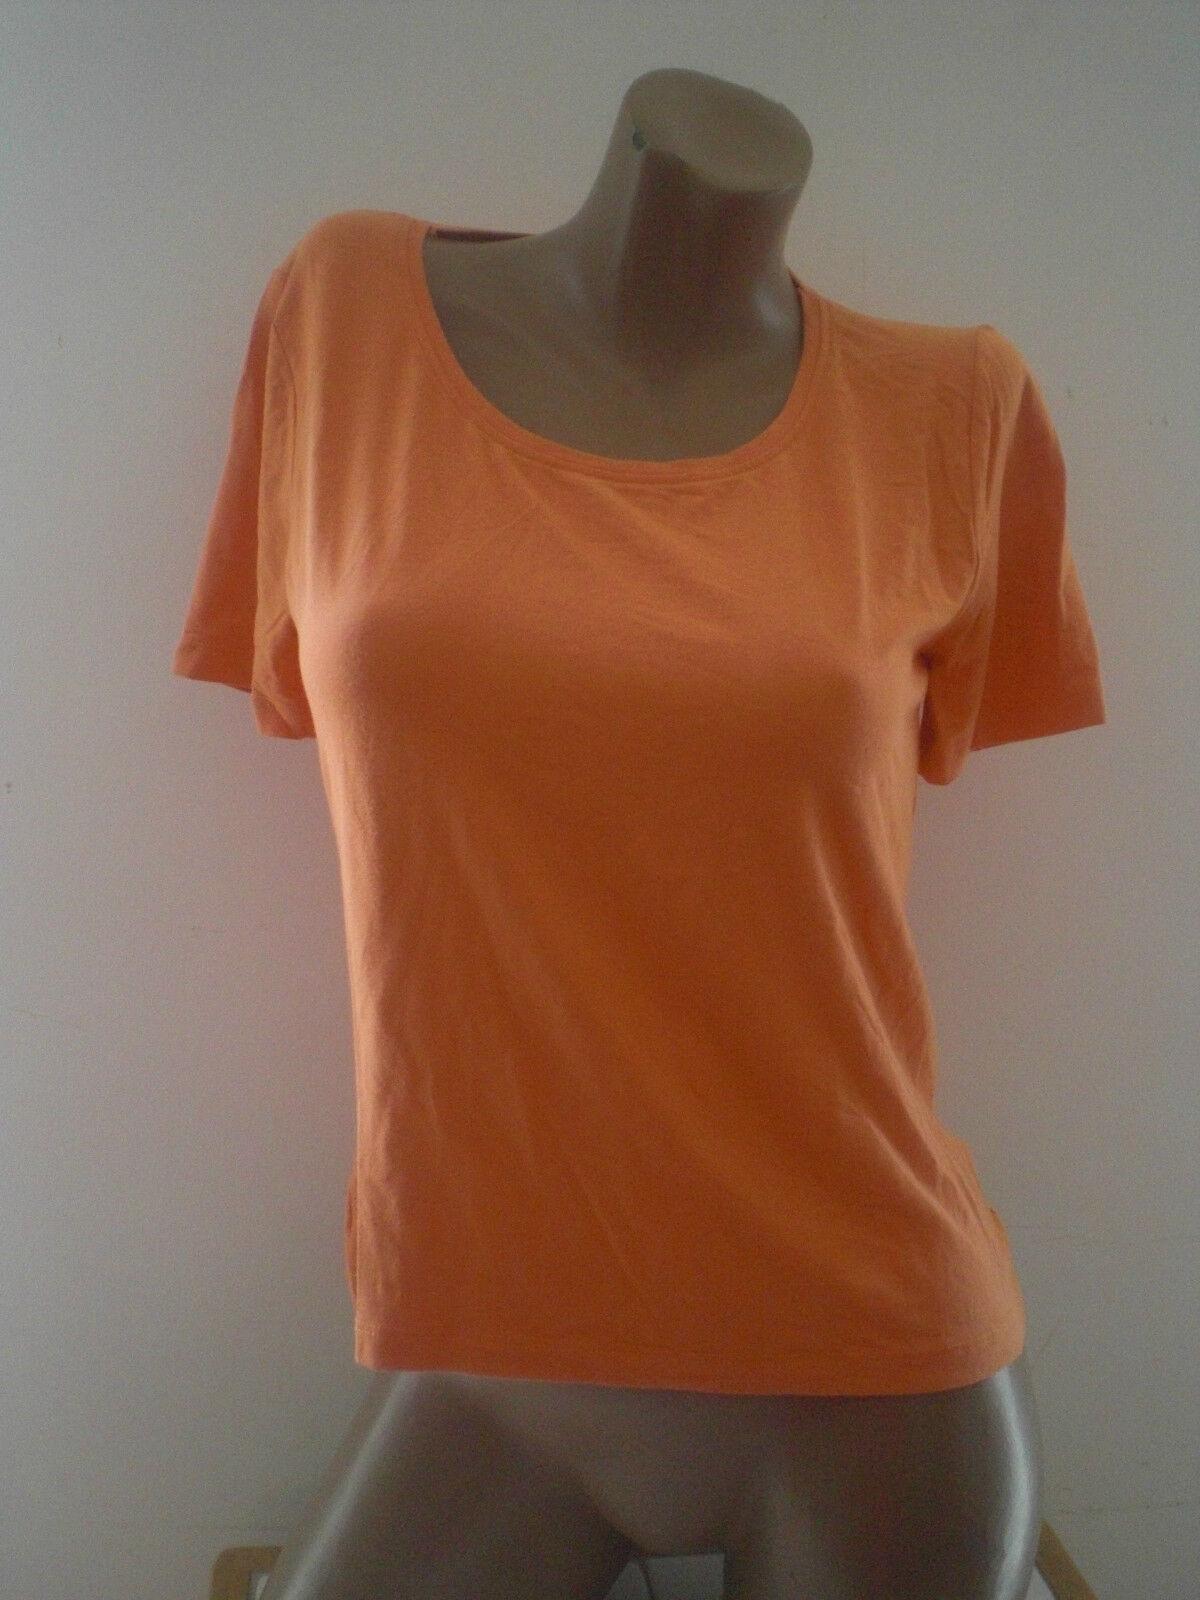 CLOTHING t-shirt woman Size 42 MANGA SHORT NEW shirt woman caymaris REF. 98